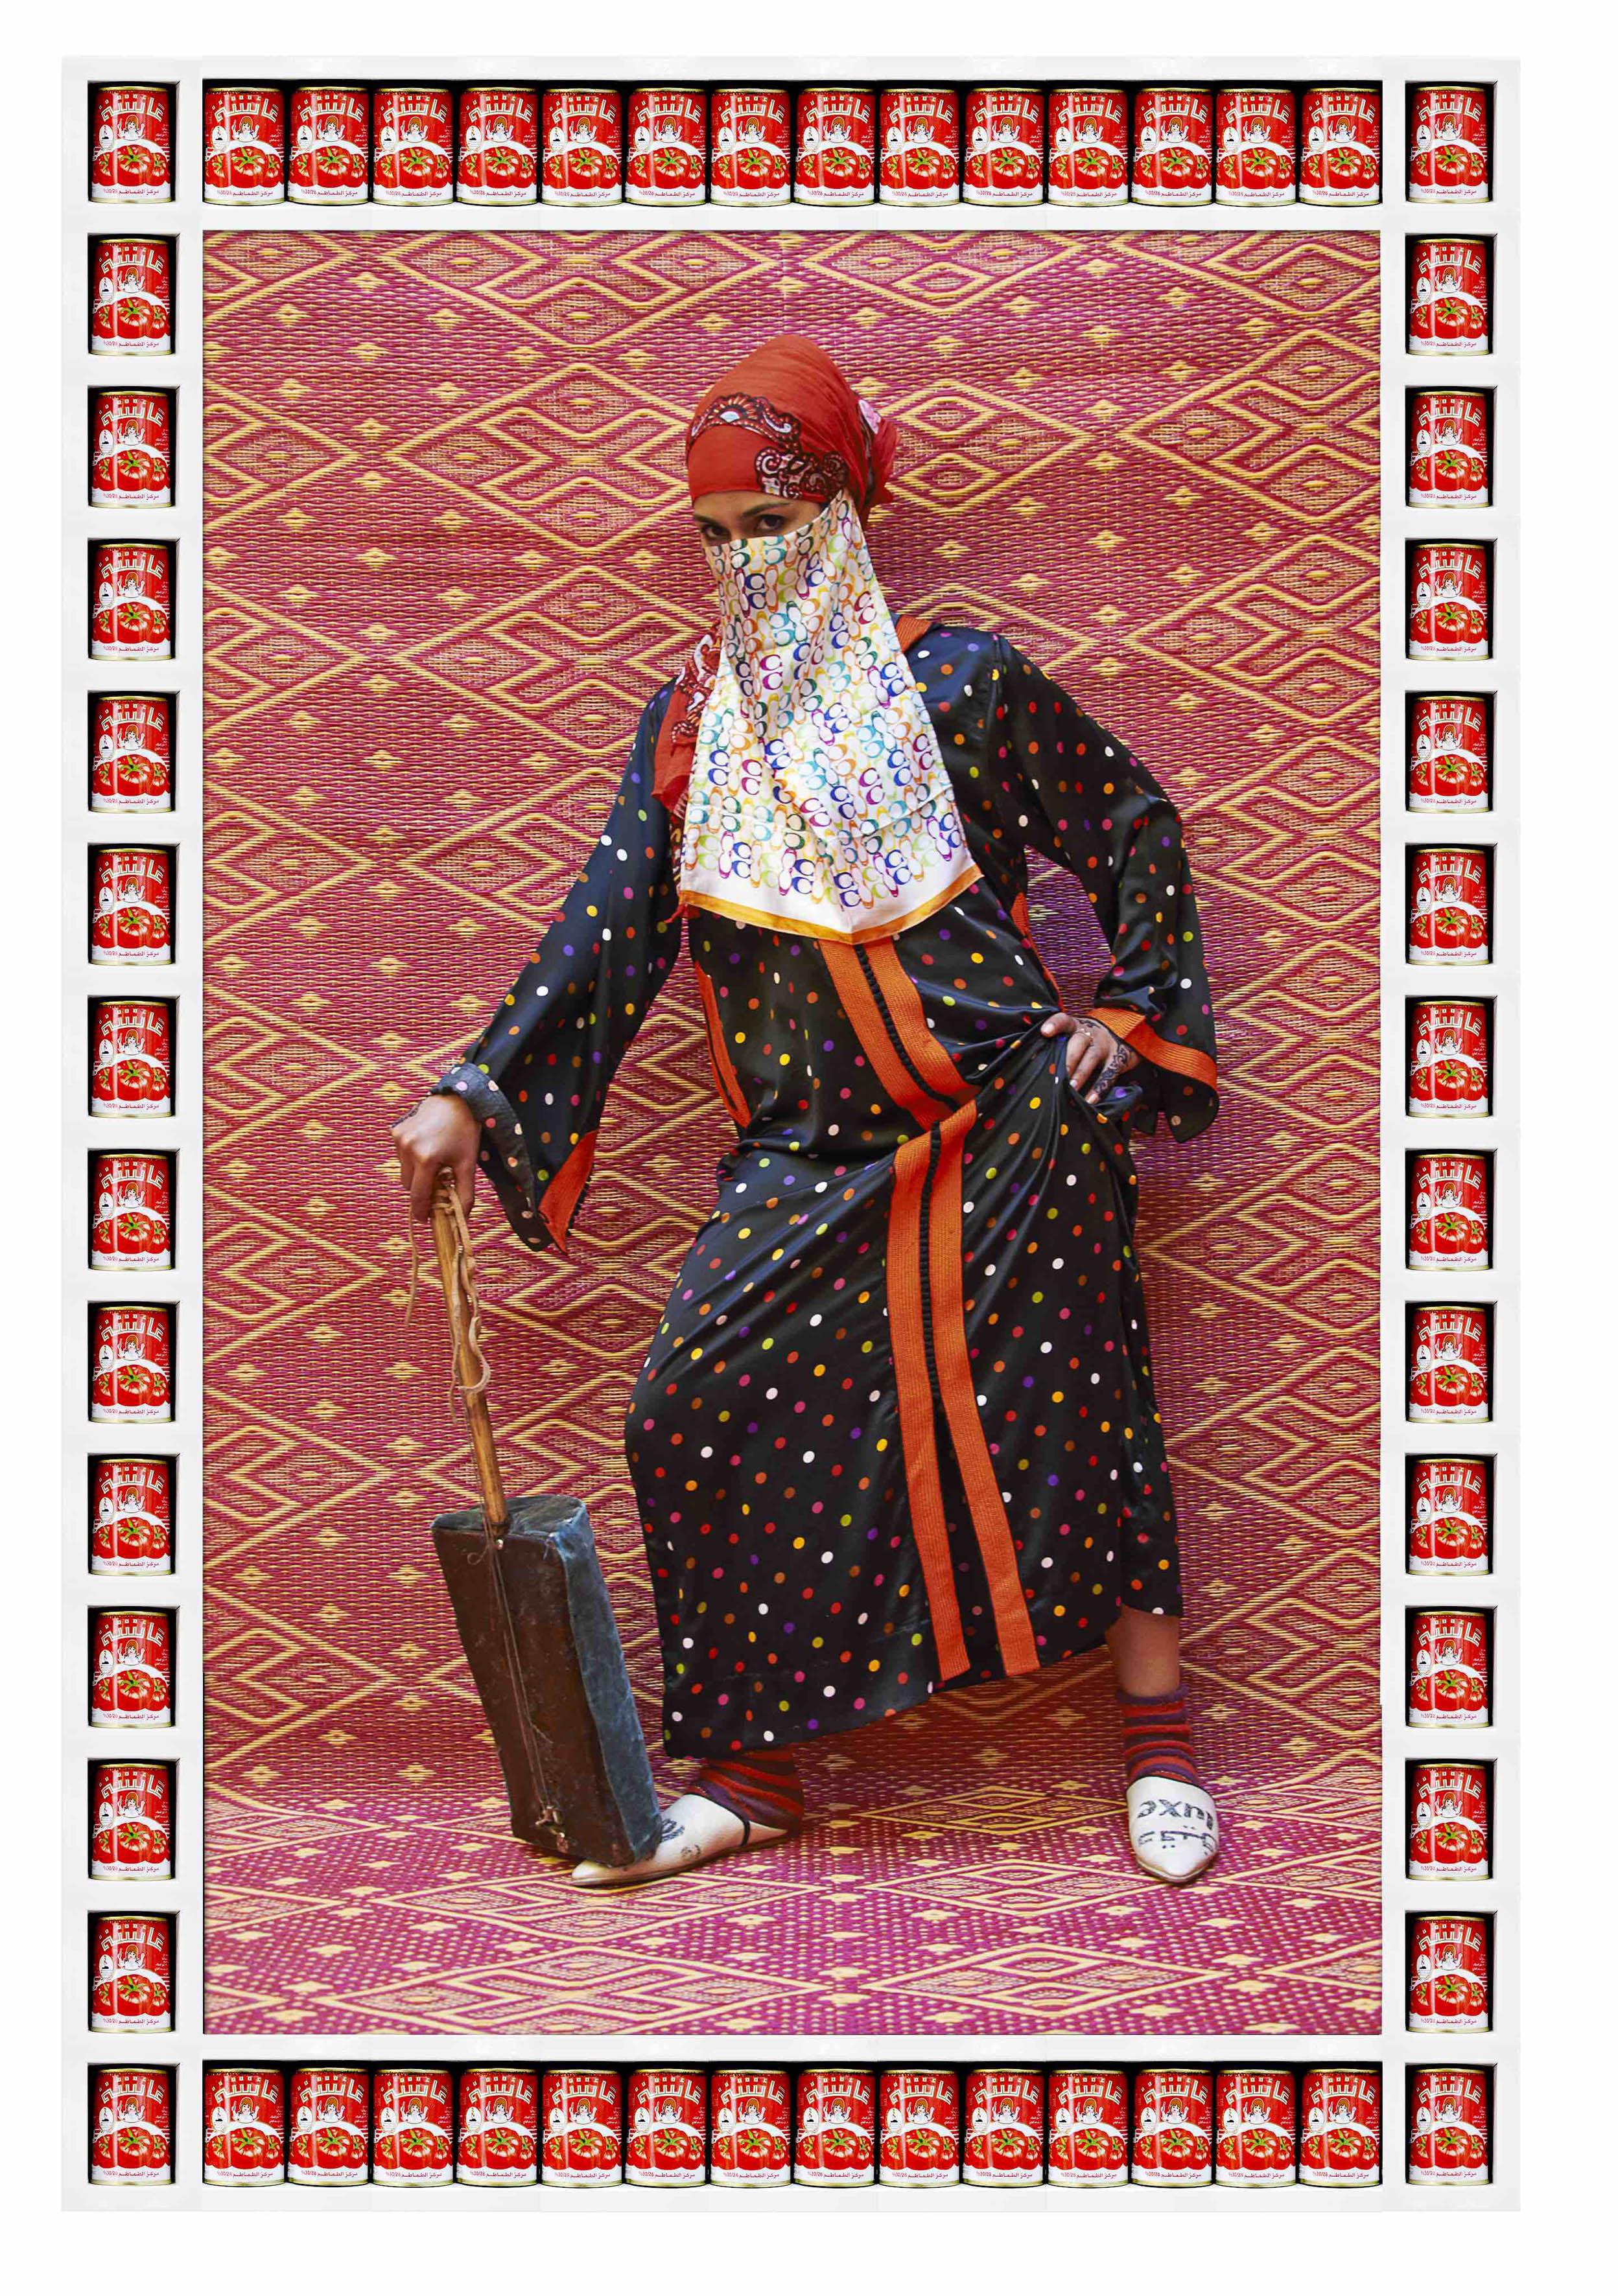 Hassan Hajjaj,